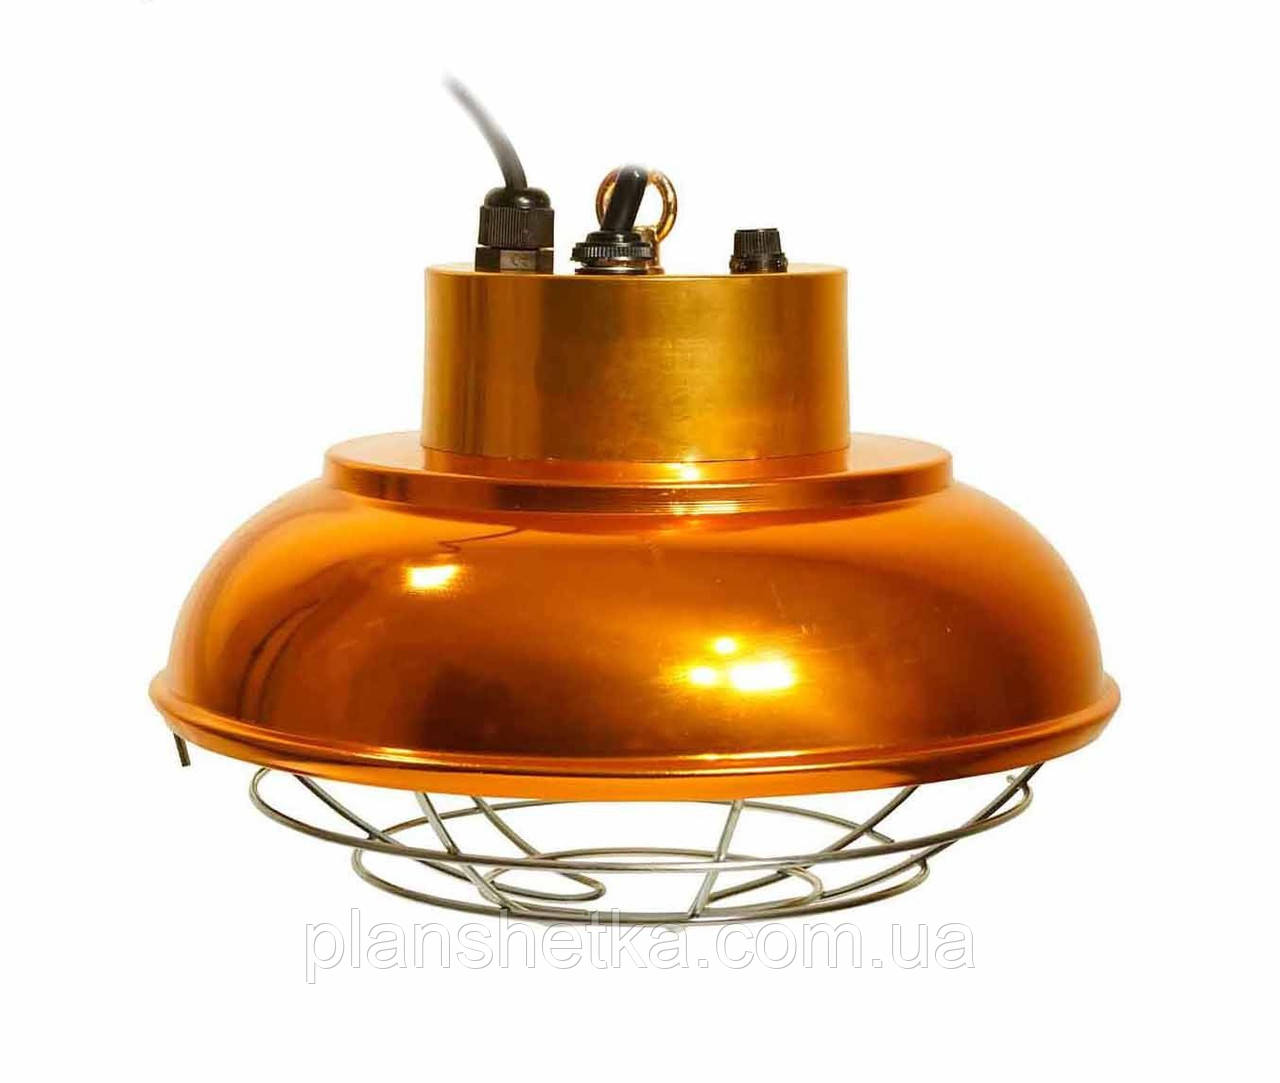 Рефлектор з галогенною лампою (абажур) Tehnomur S1030 колір бронза